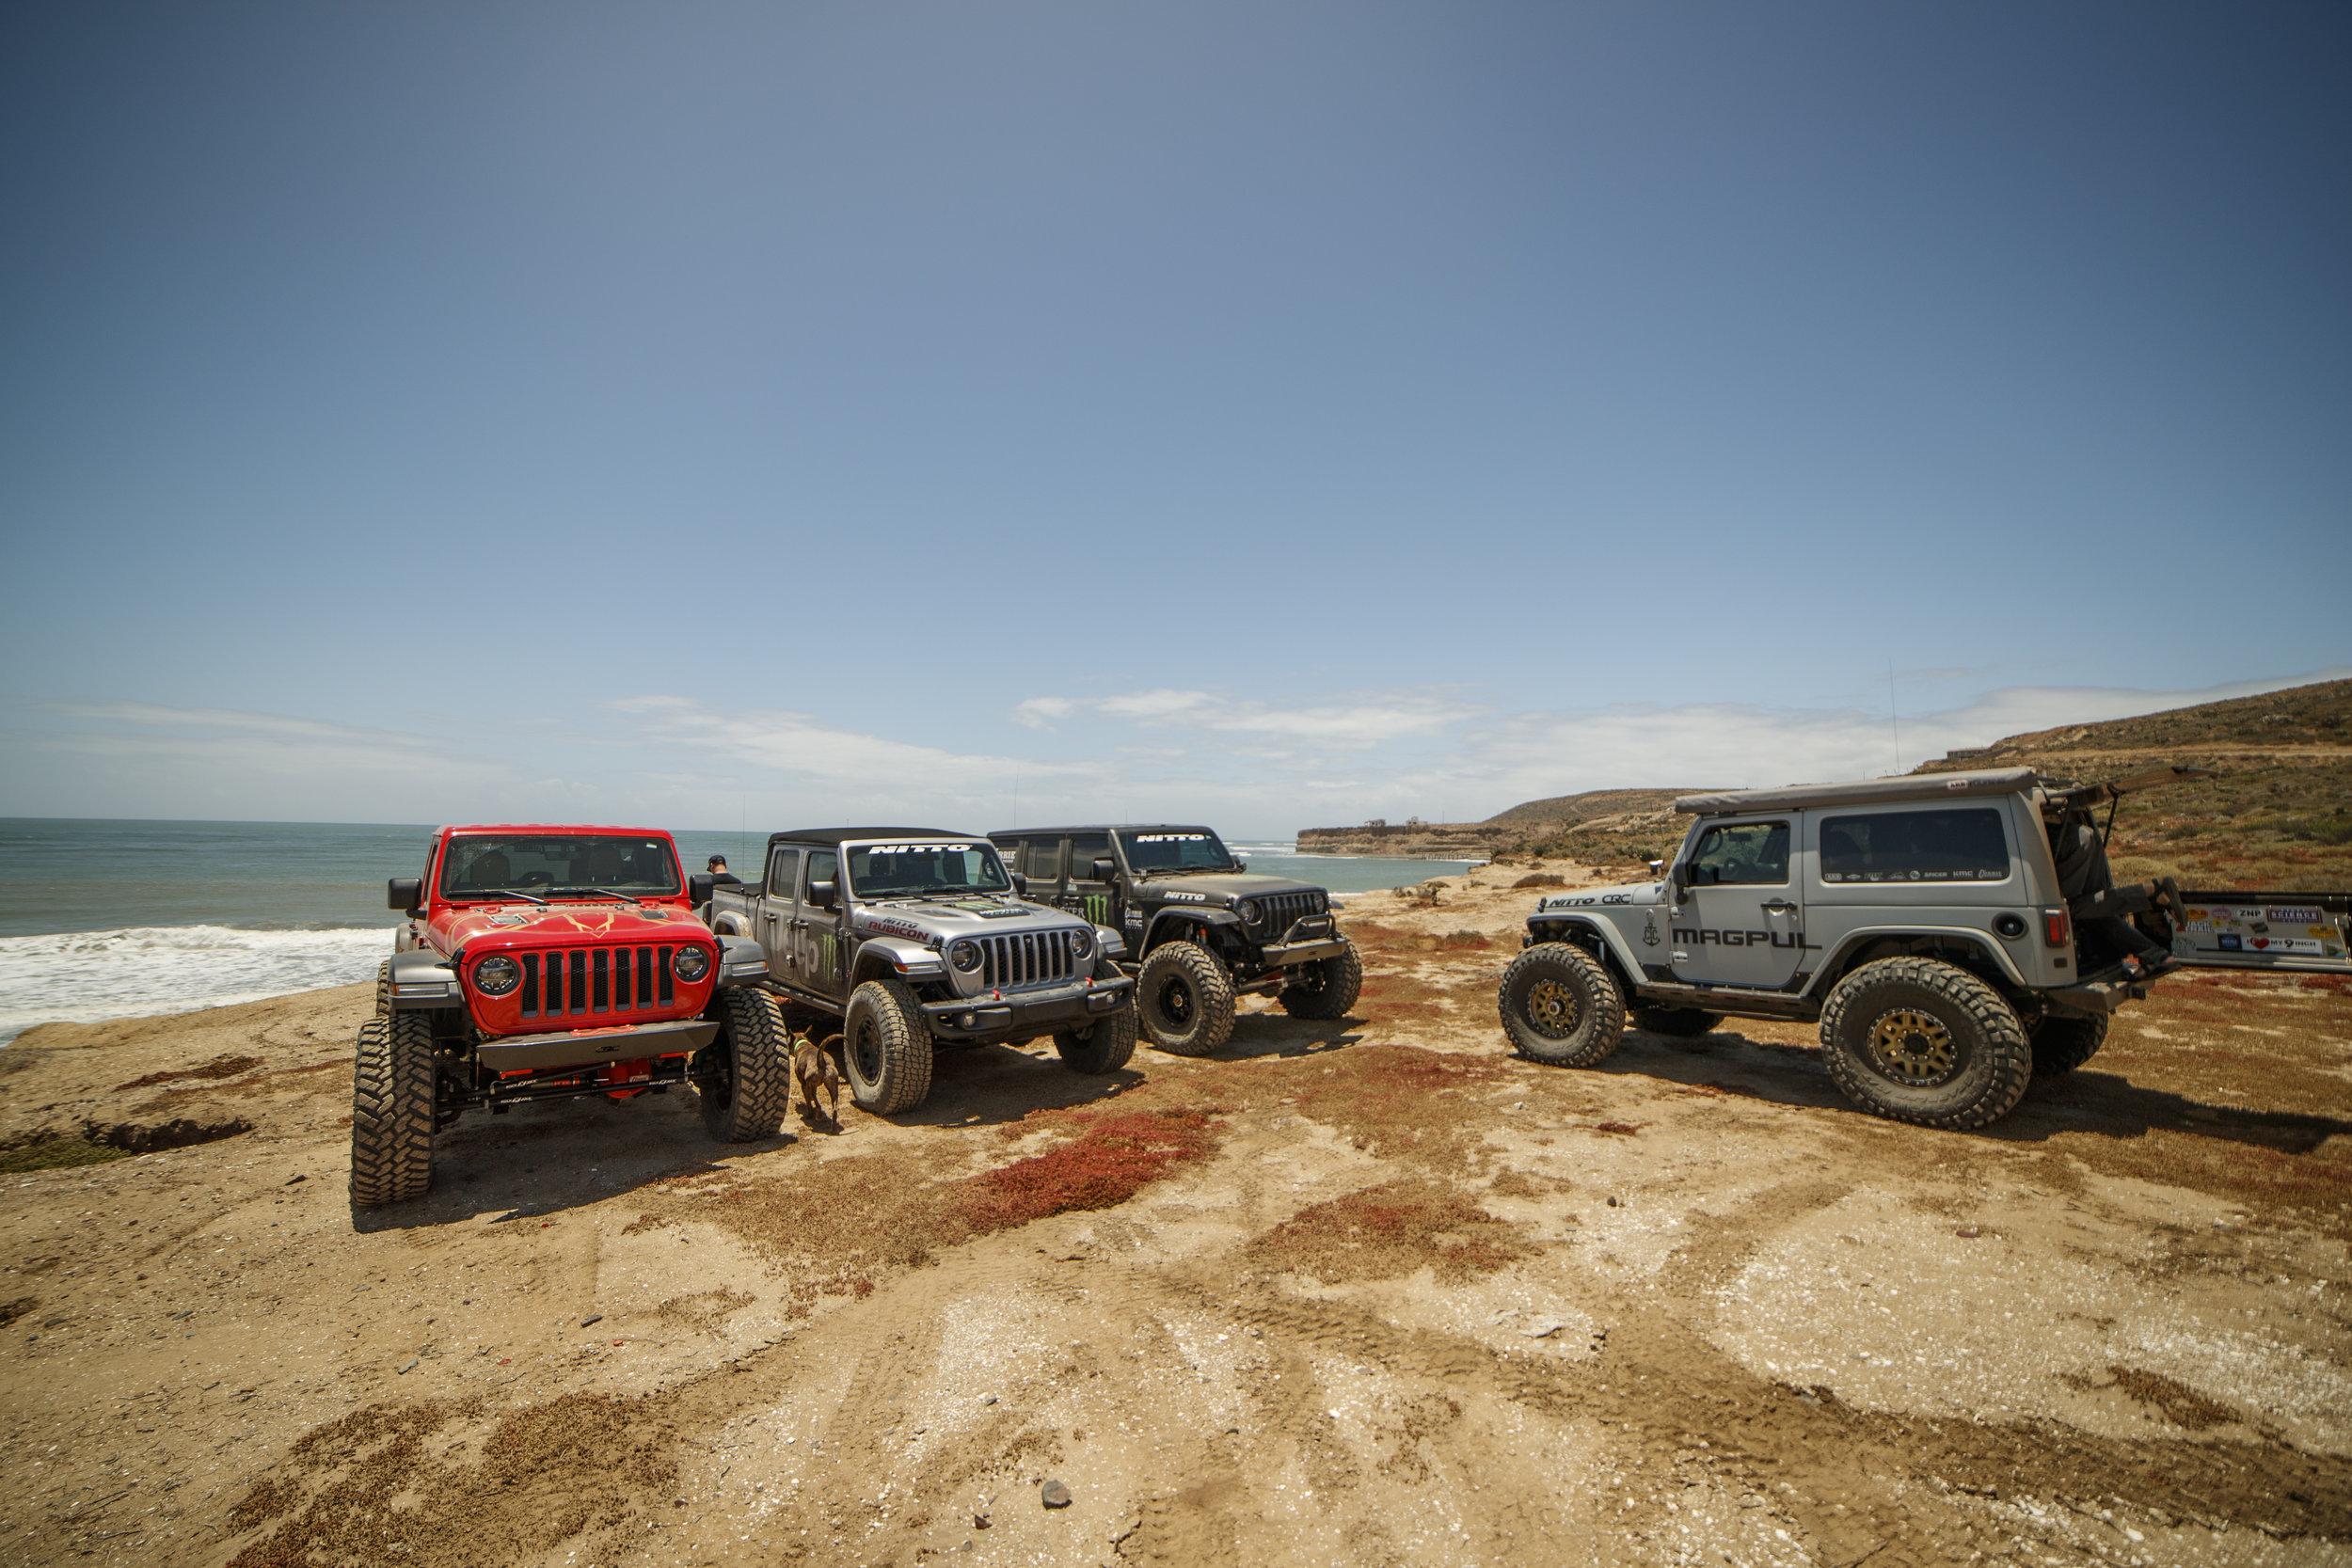 6_24_CaseyCurrie_Baja500PreRunning_BajaMexico_Jeep_017.jpg